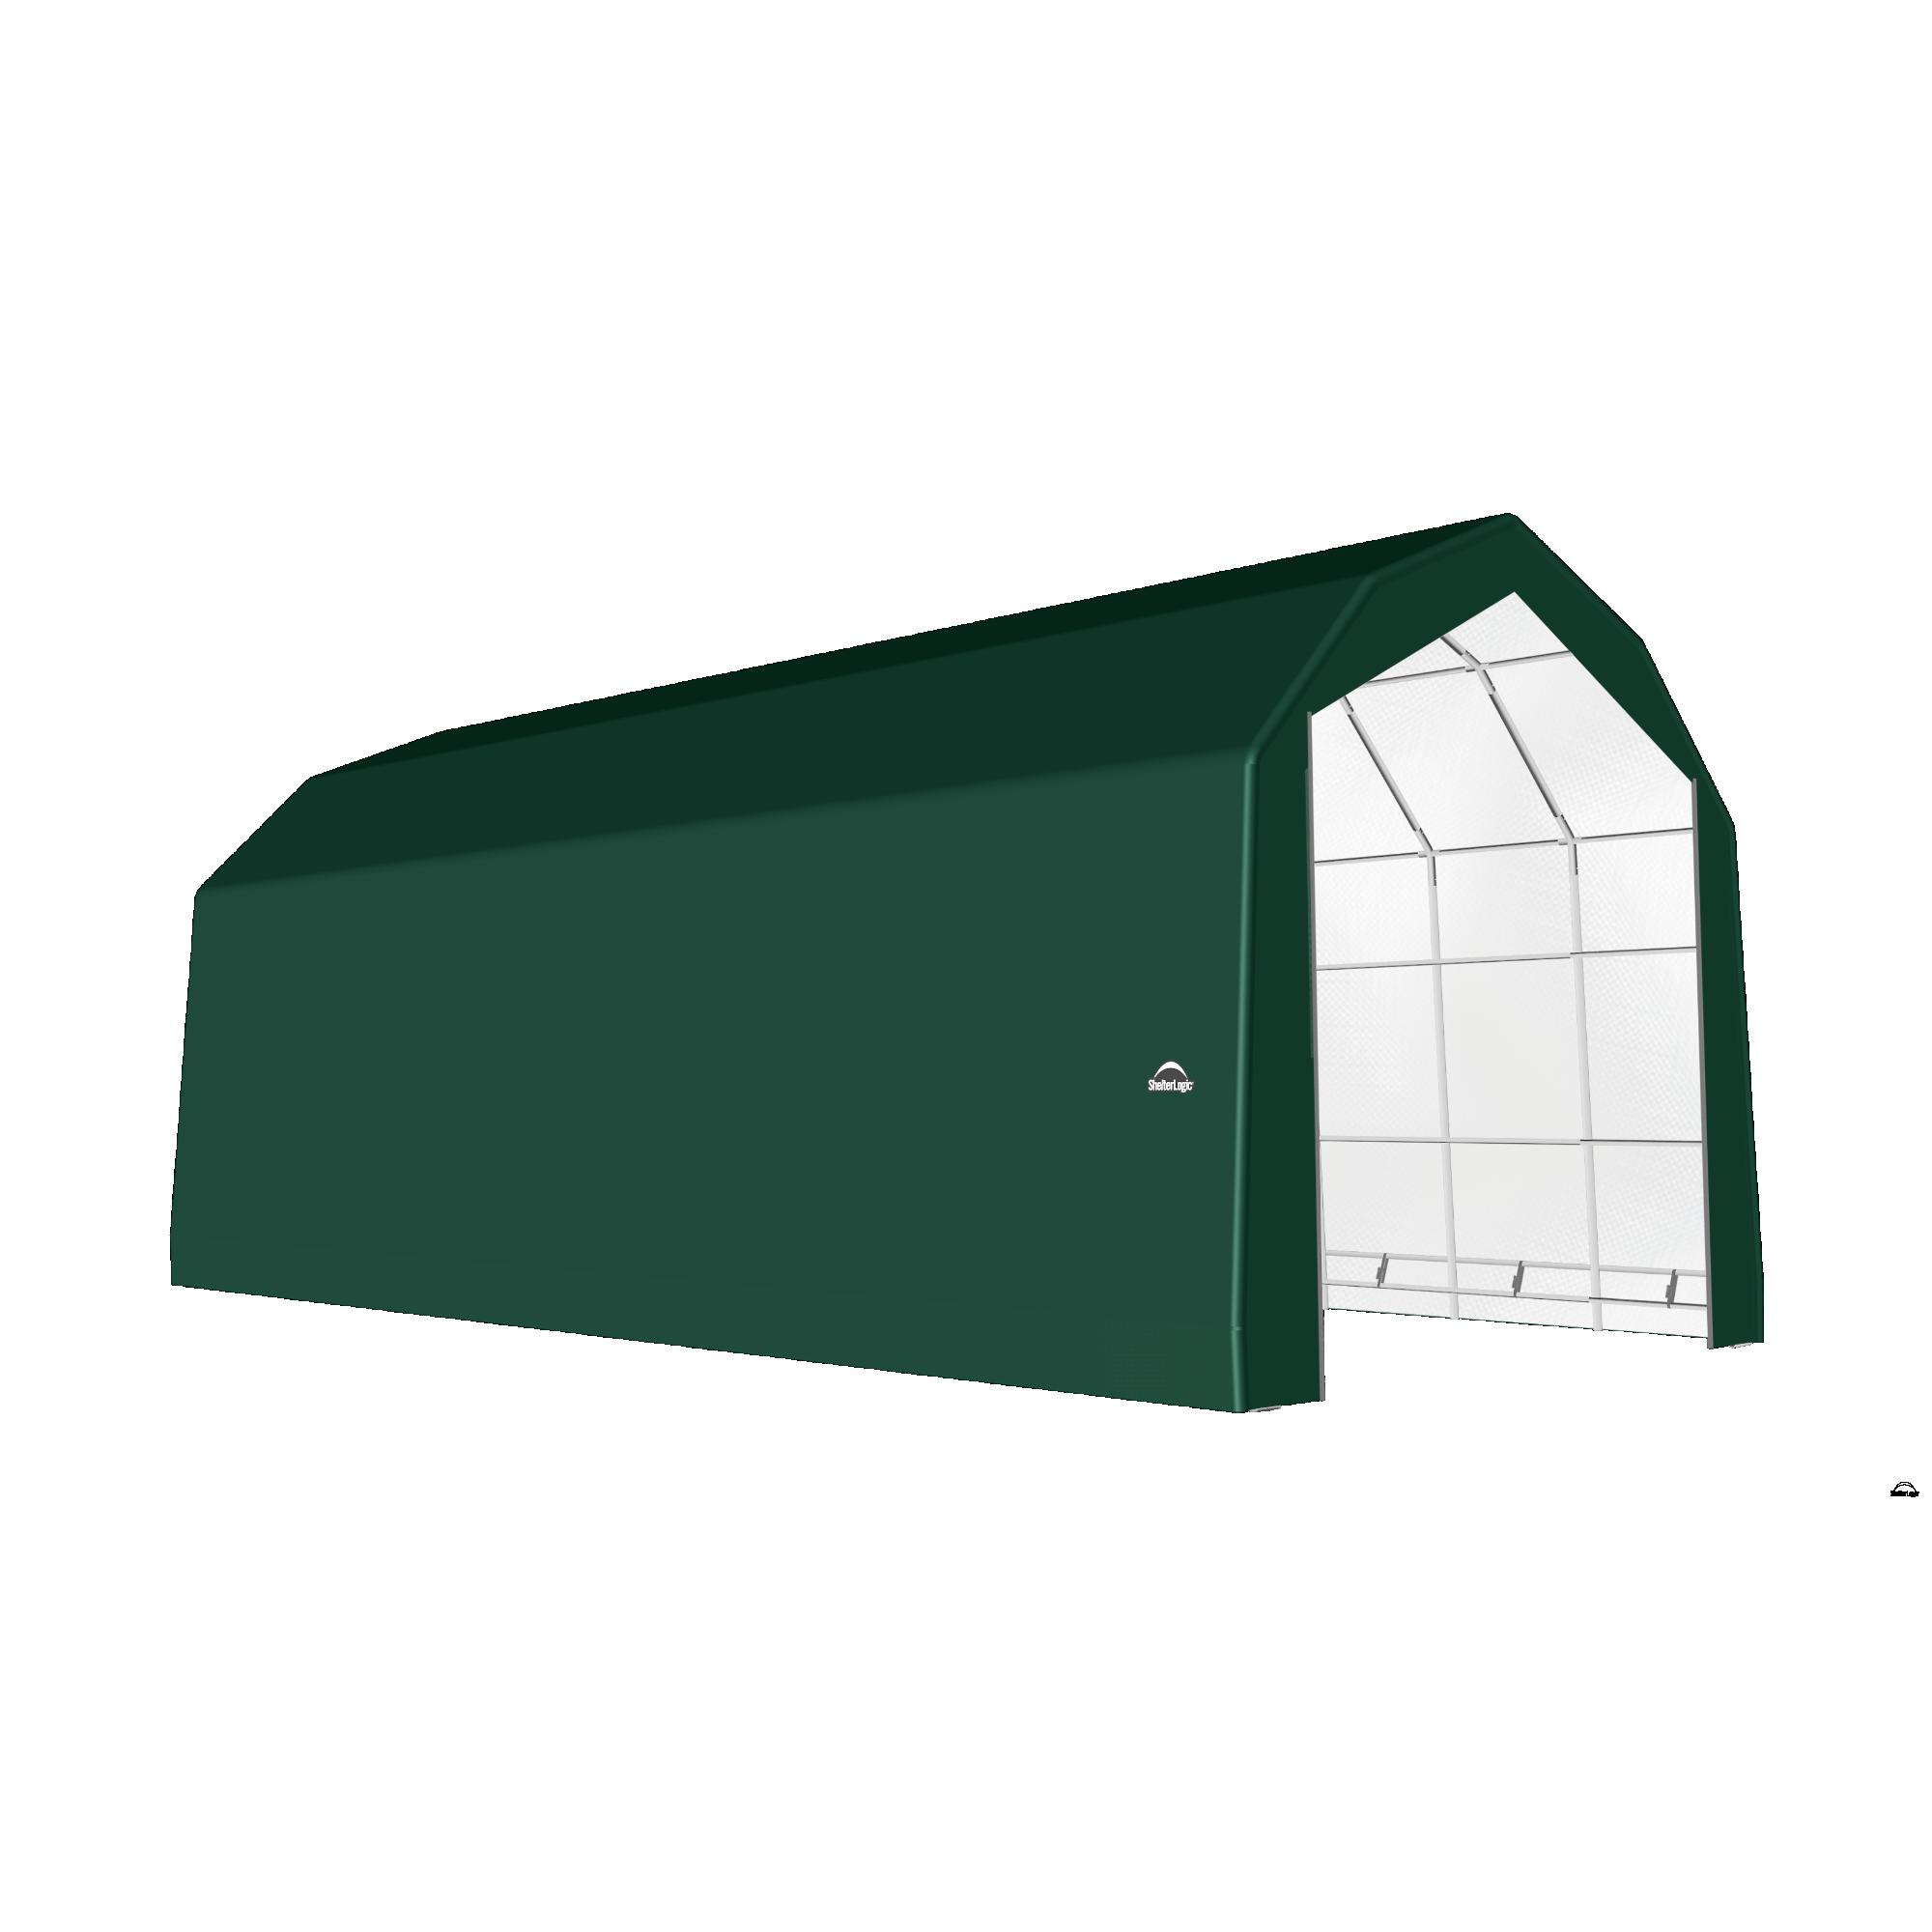 SP Barn 20X48X18 Green 14 oz PE Shelter